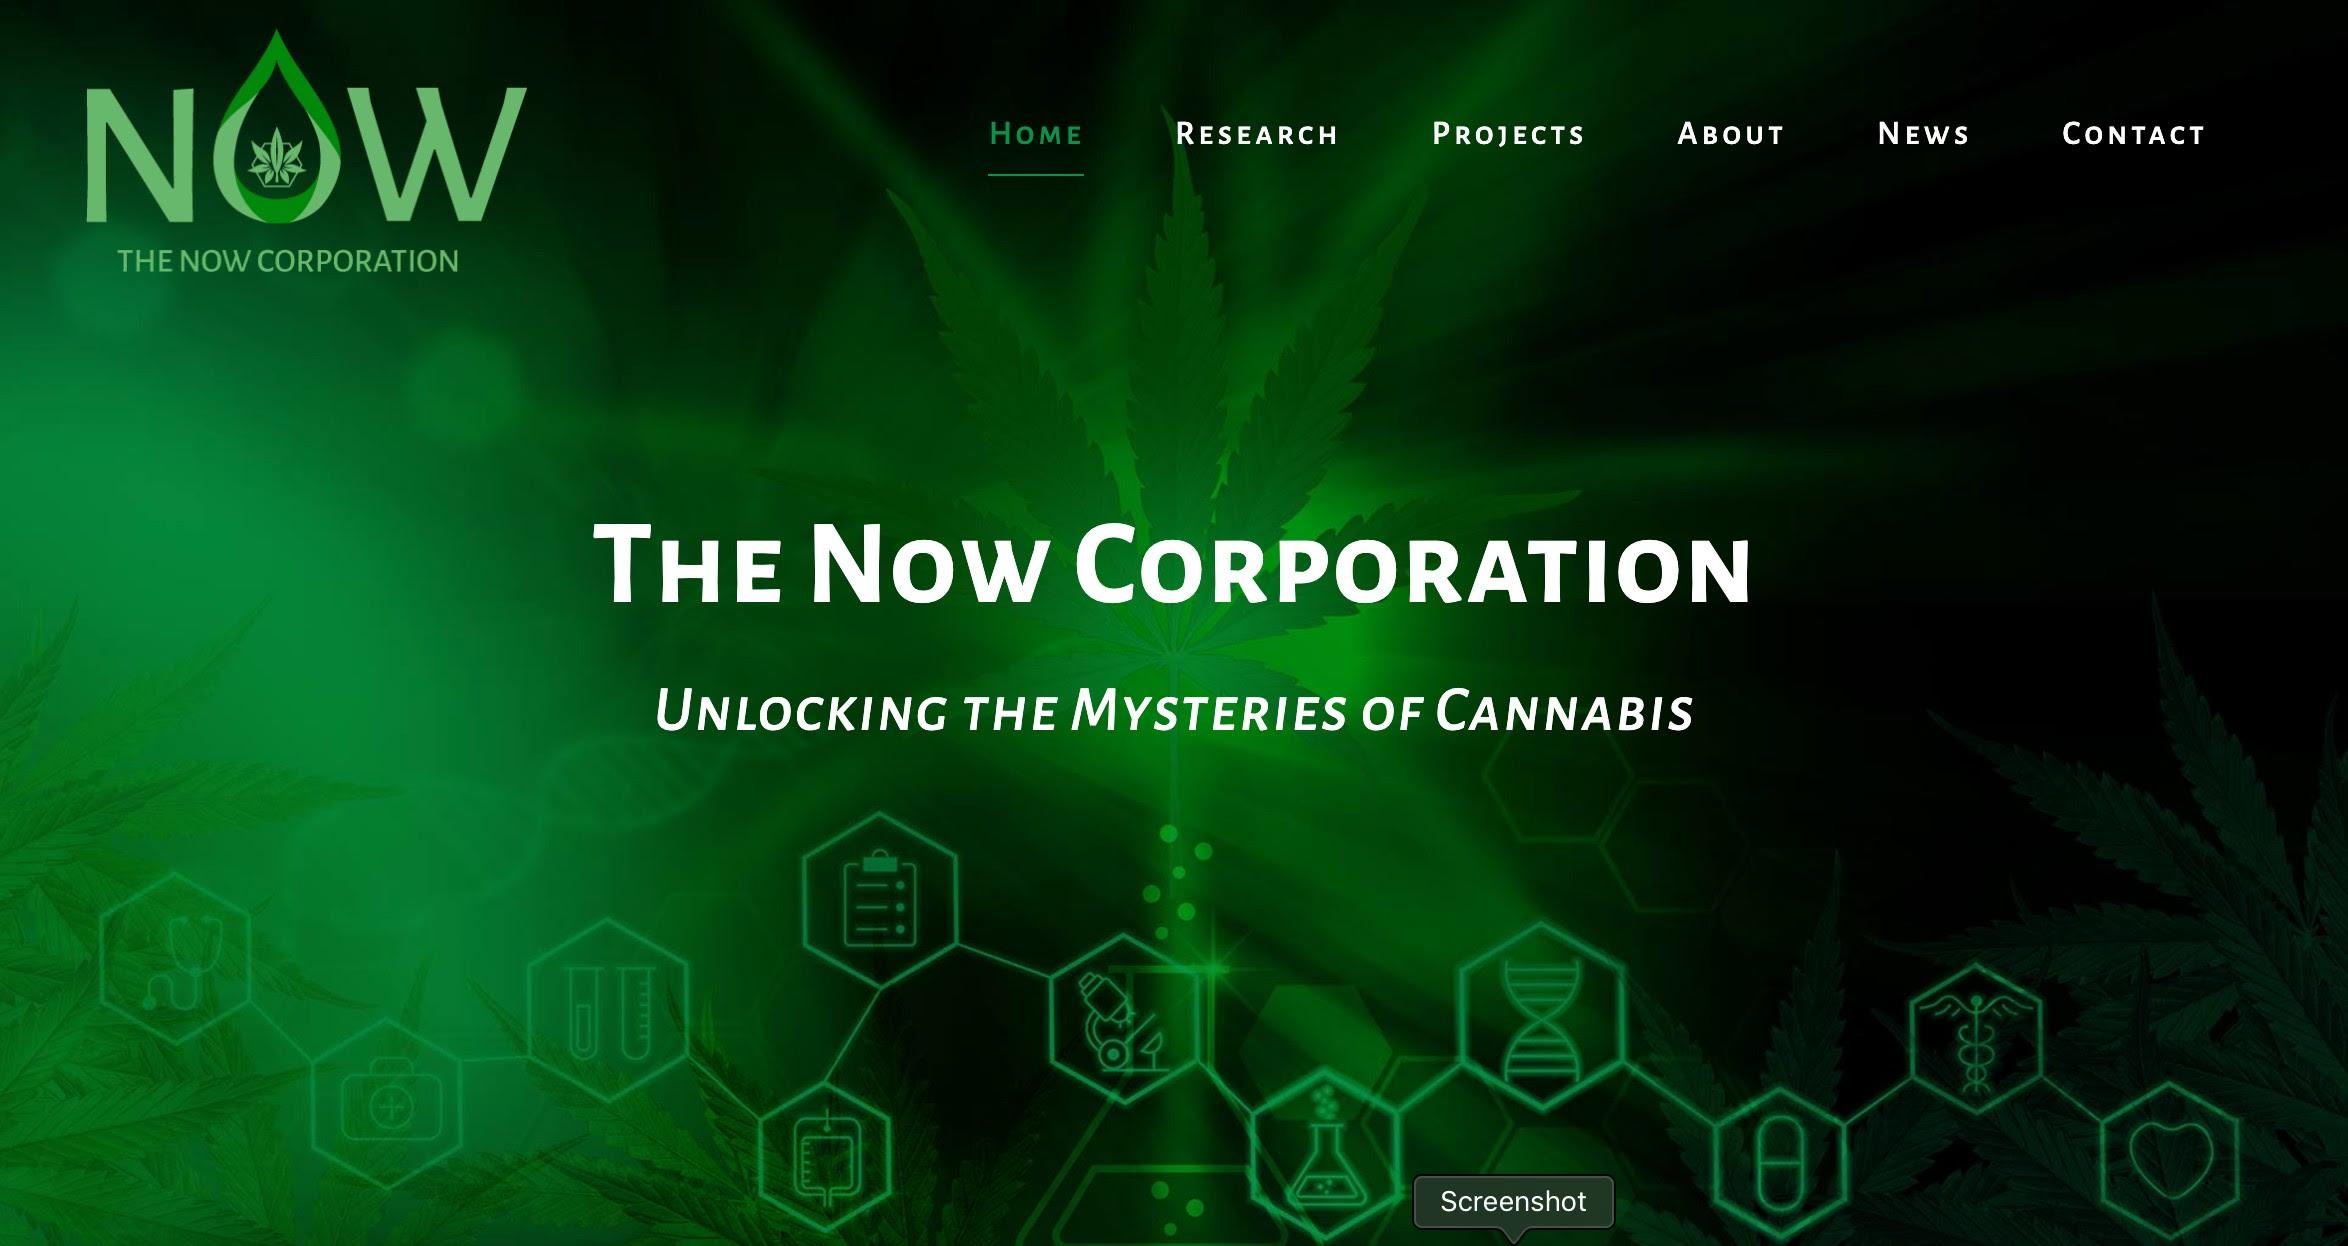 The Now Corporation (OTC:NWPN) | LinkedIn